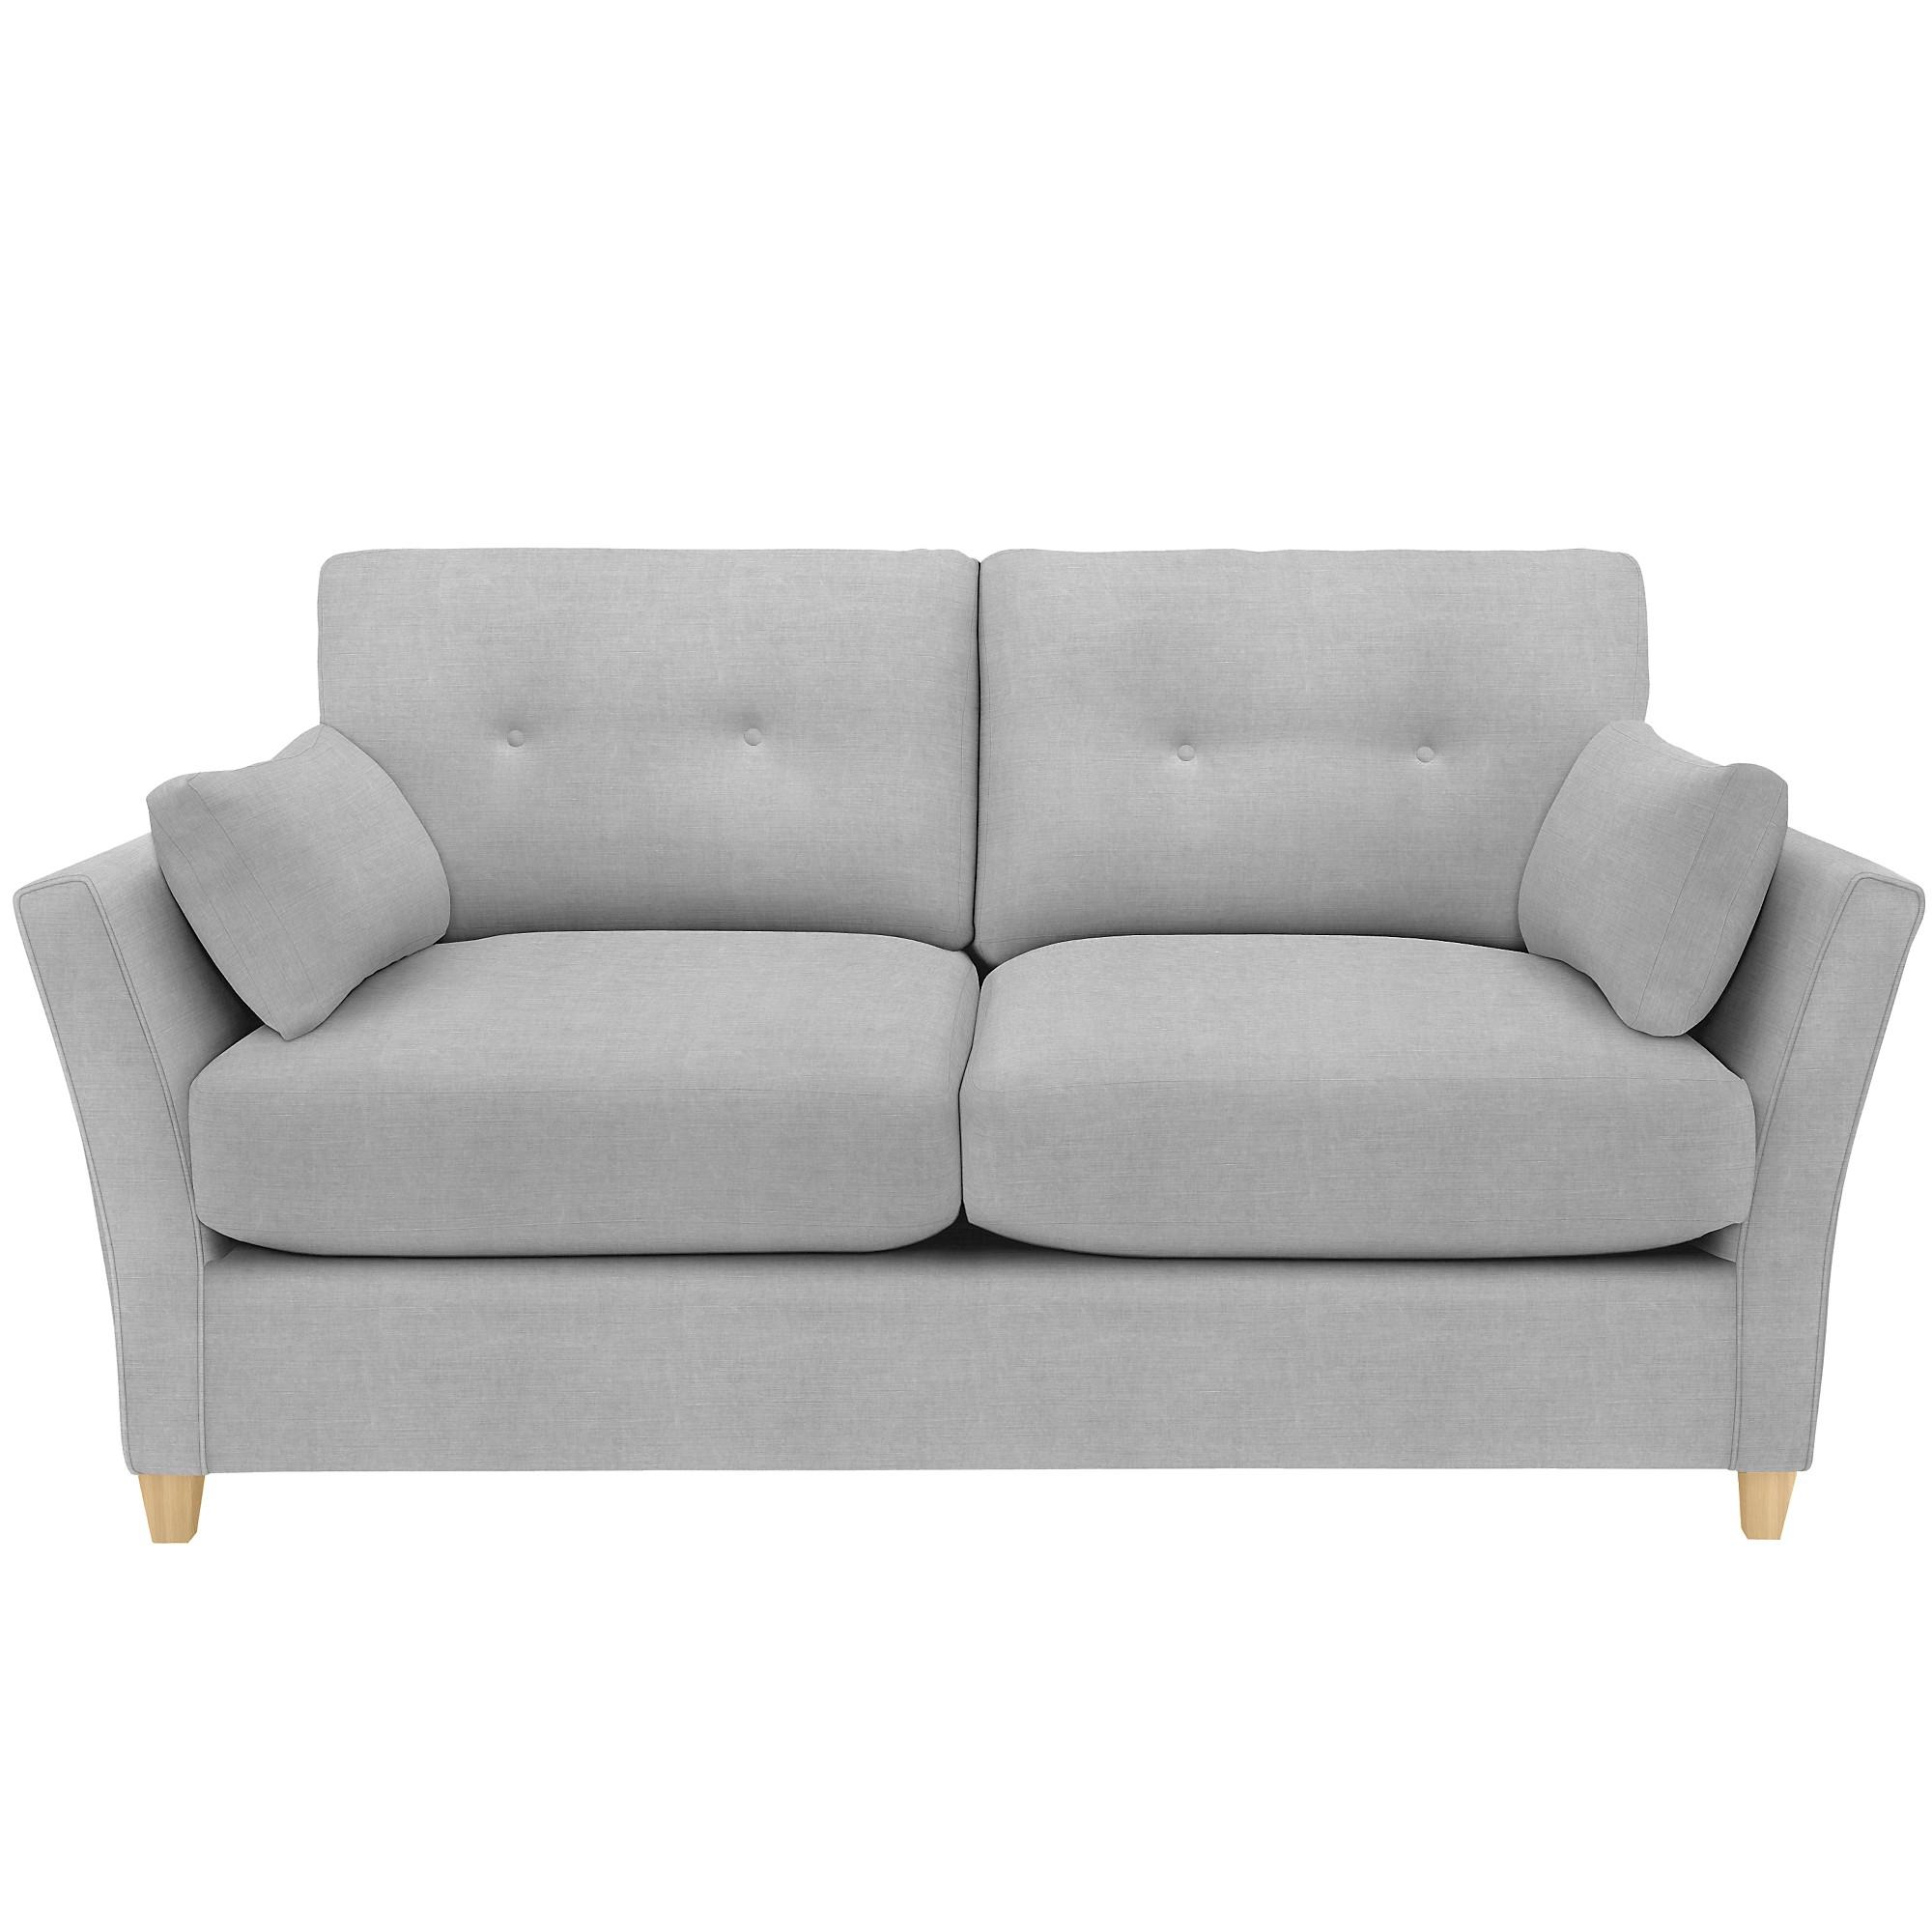 John Lewis Chopin Grand Pocket Sprung Sofa Bed